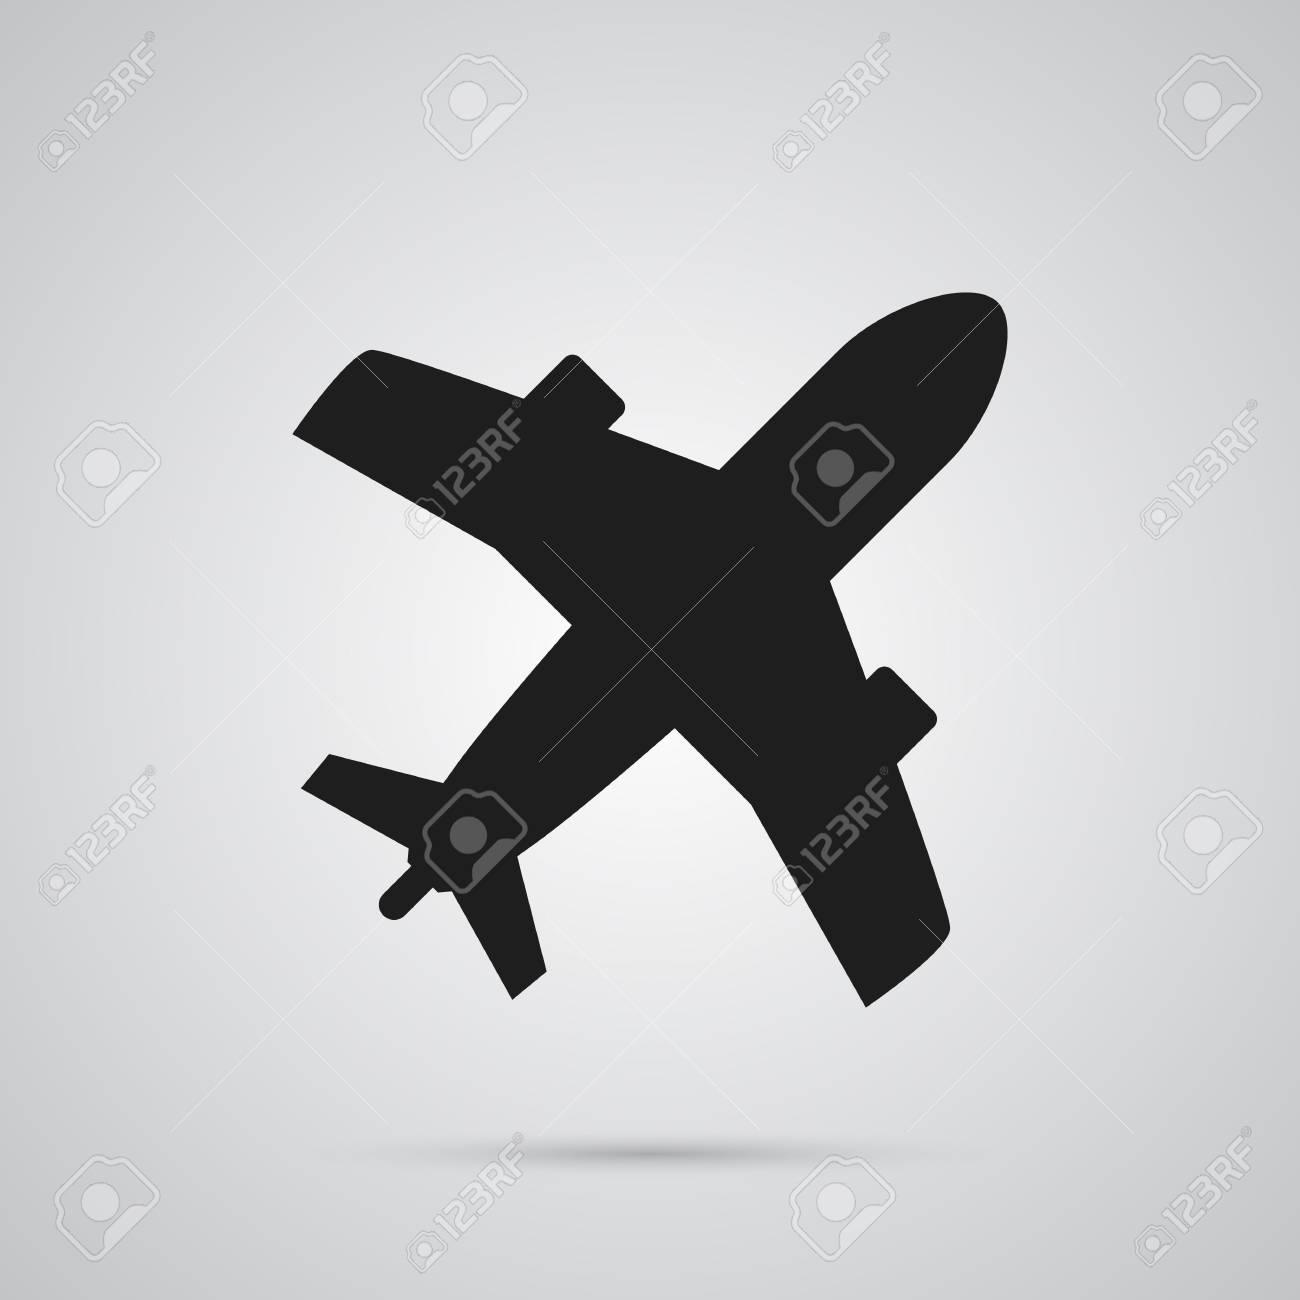 Isolated plane icon symbol on clean background vector aircraft isolated plane icon symbol on clean background vector aircraft element in trendy style stock buycottarizona Gallery